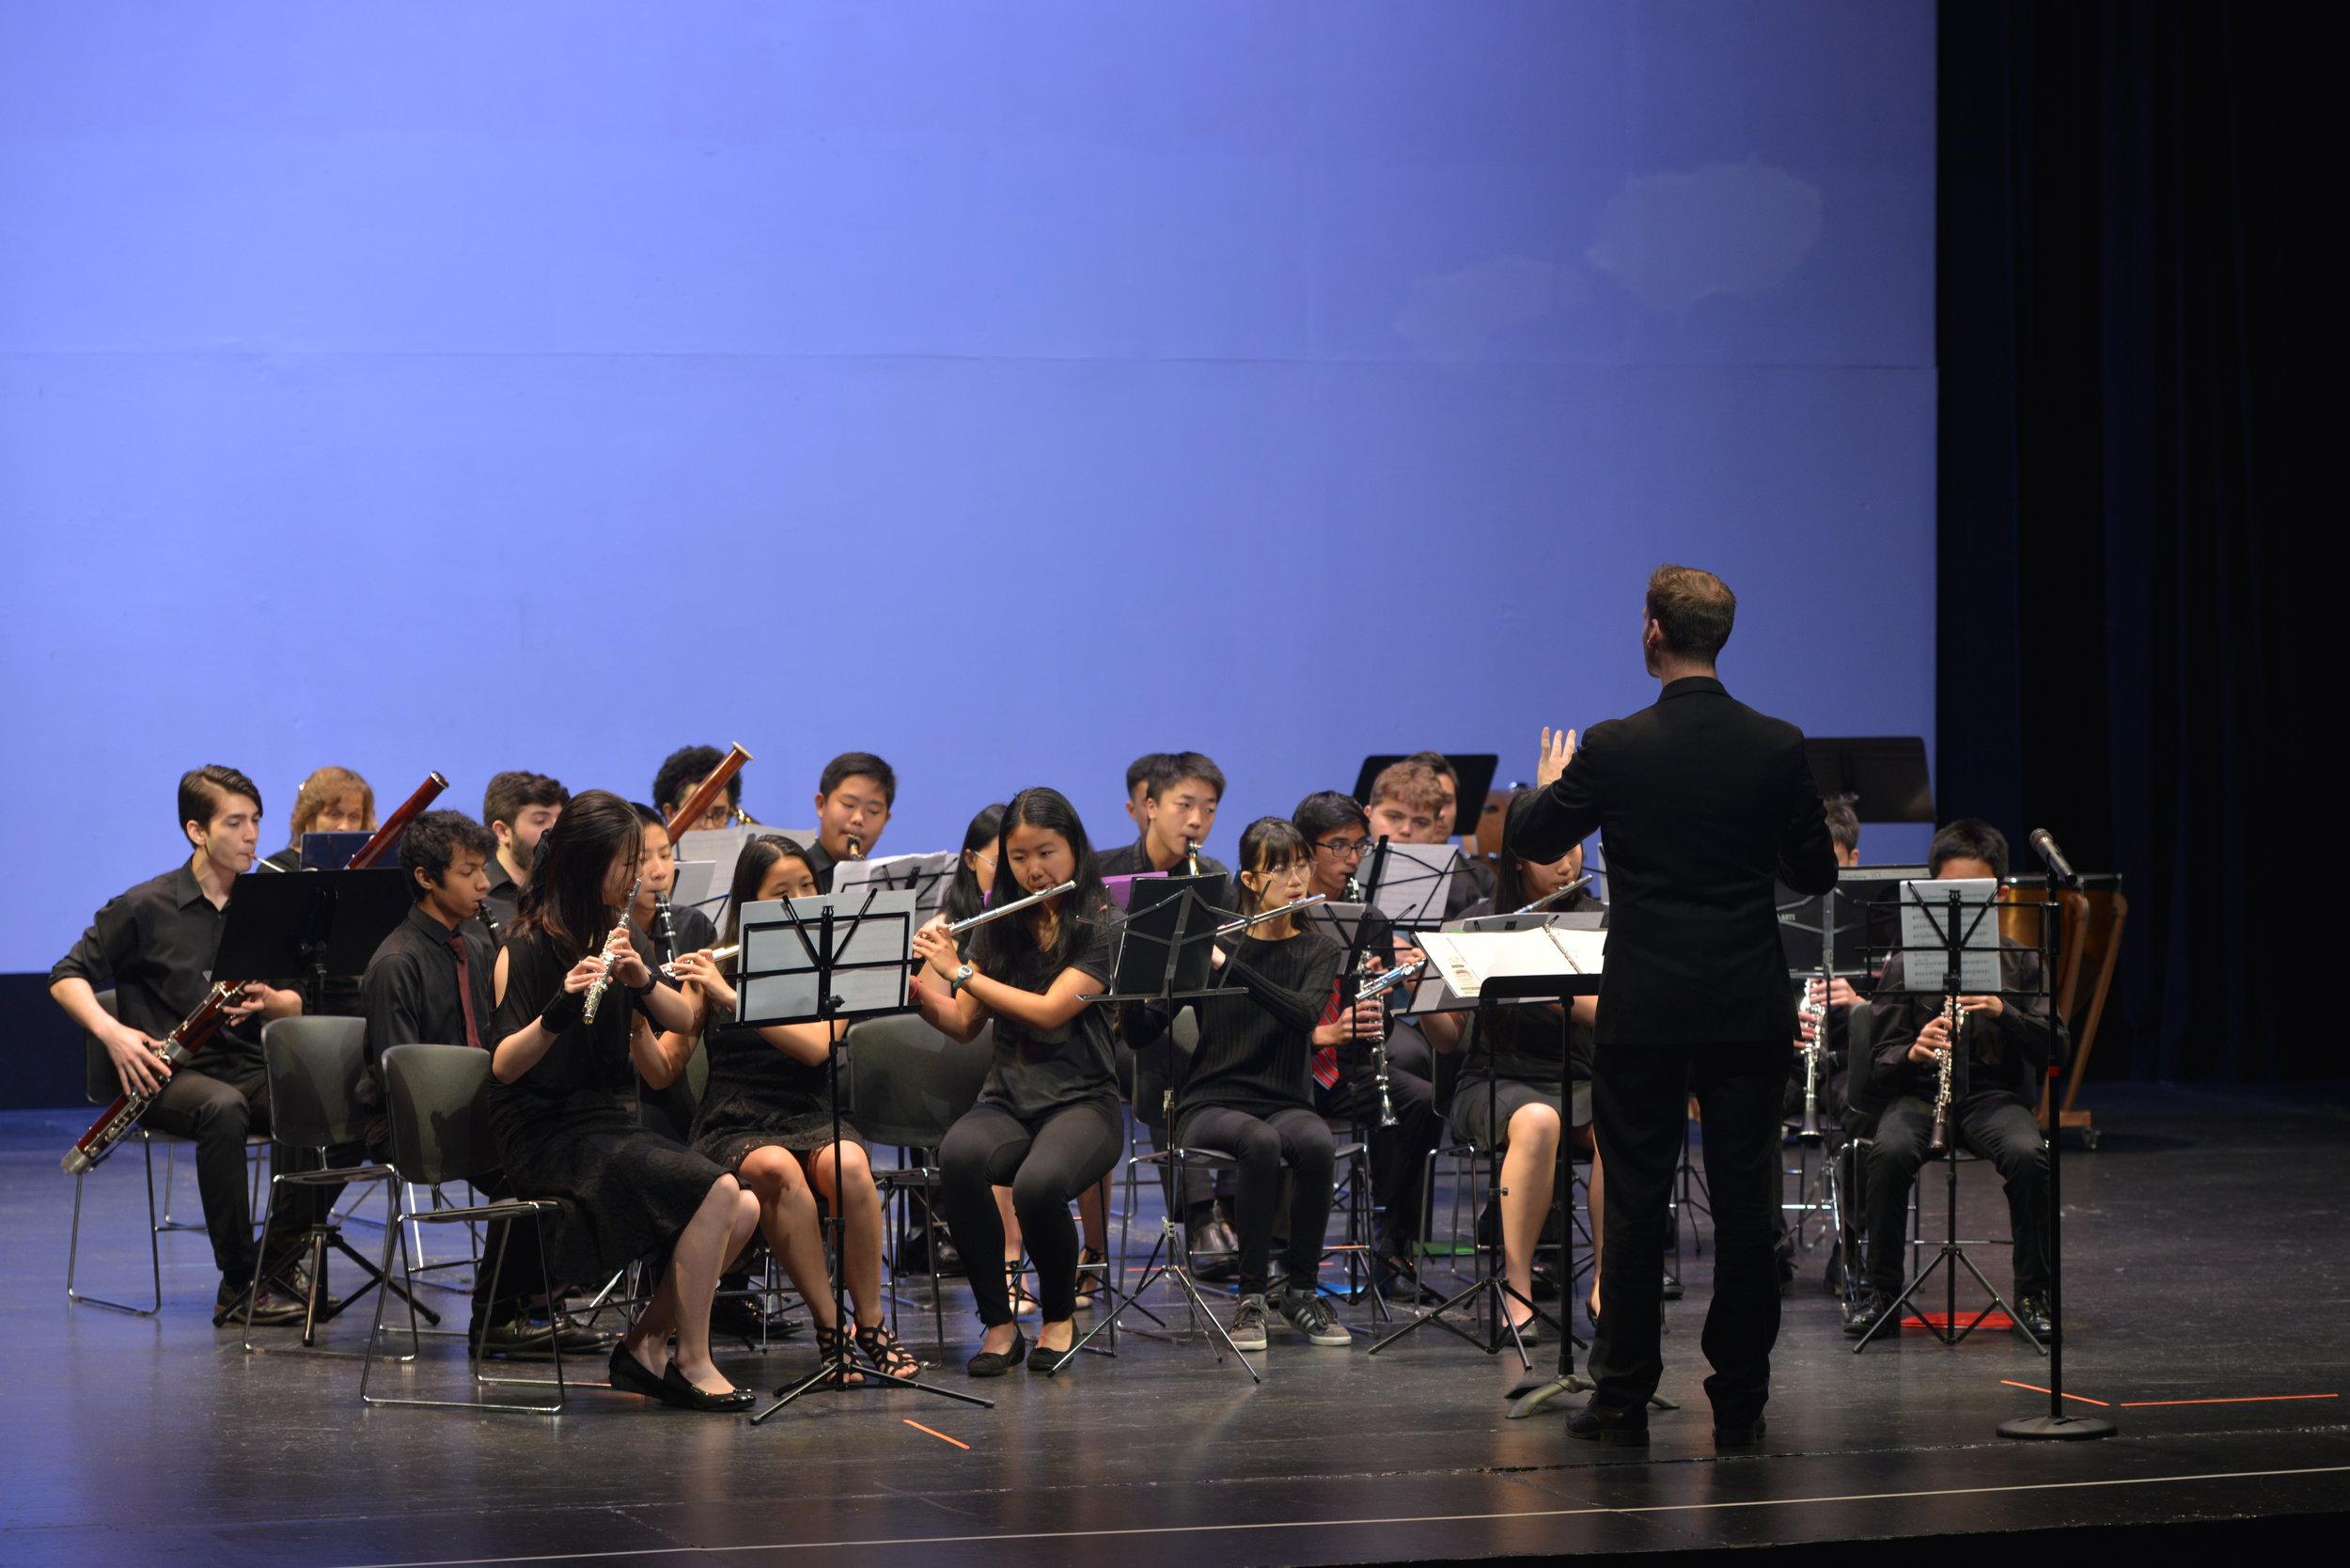 Mr. Hansel conducting the Wind Ensemble